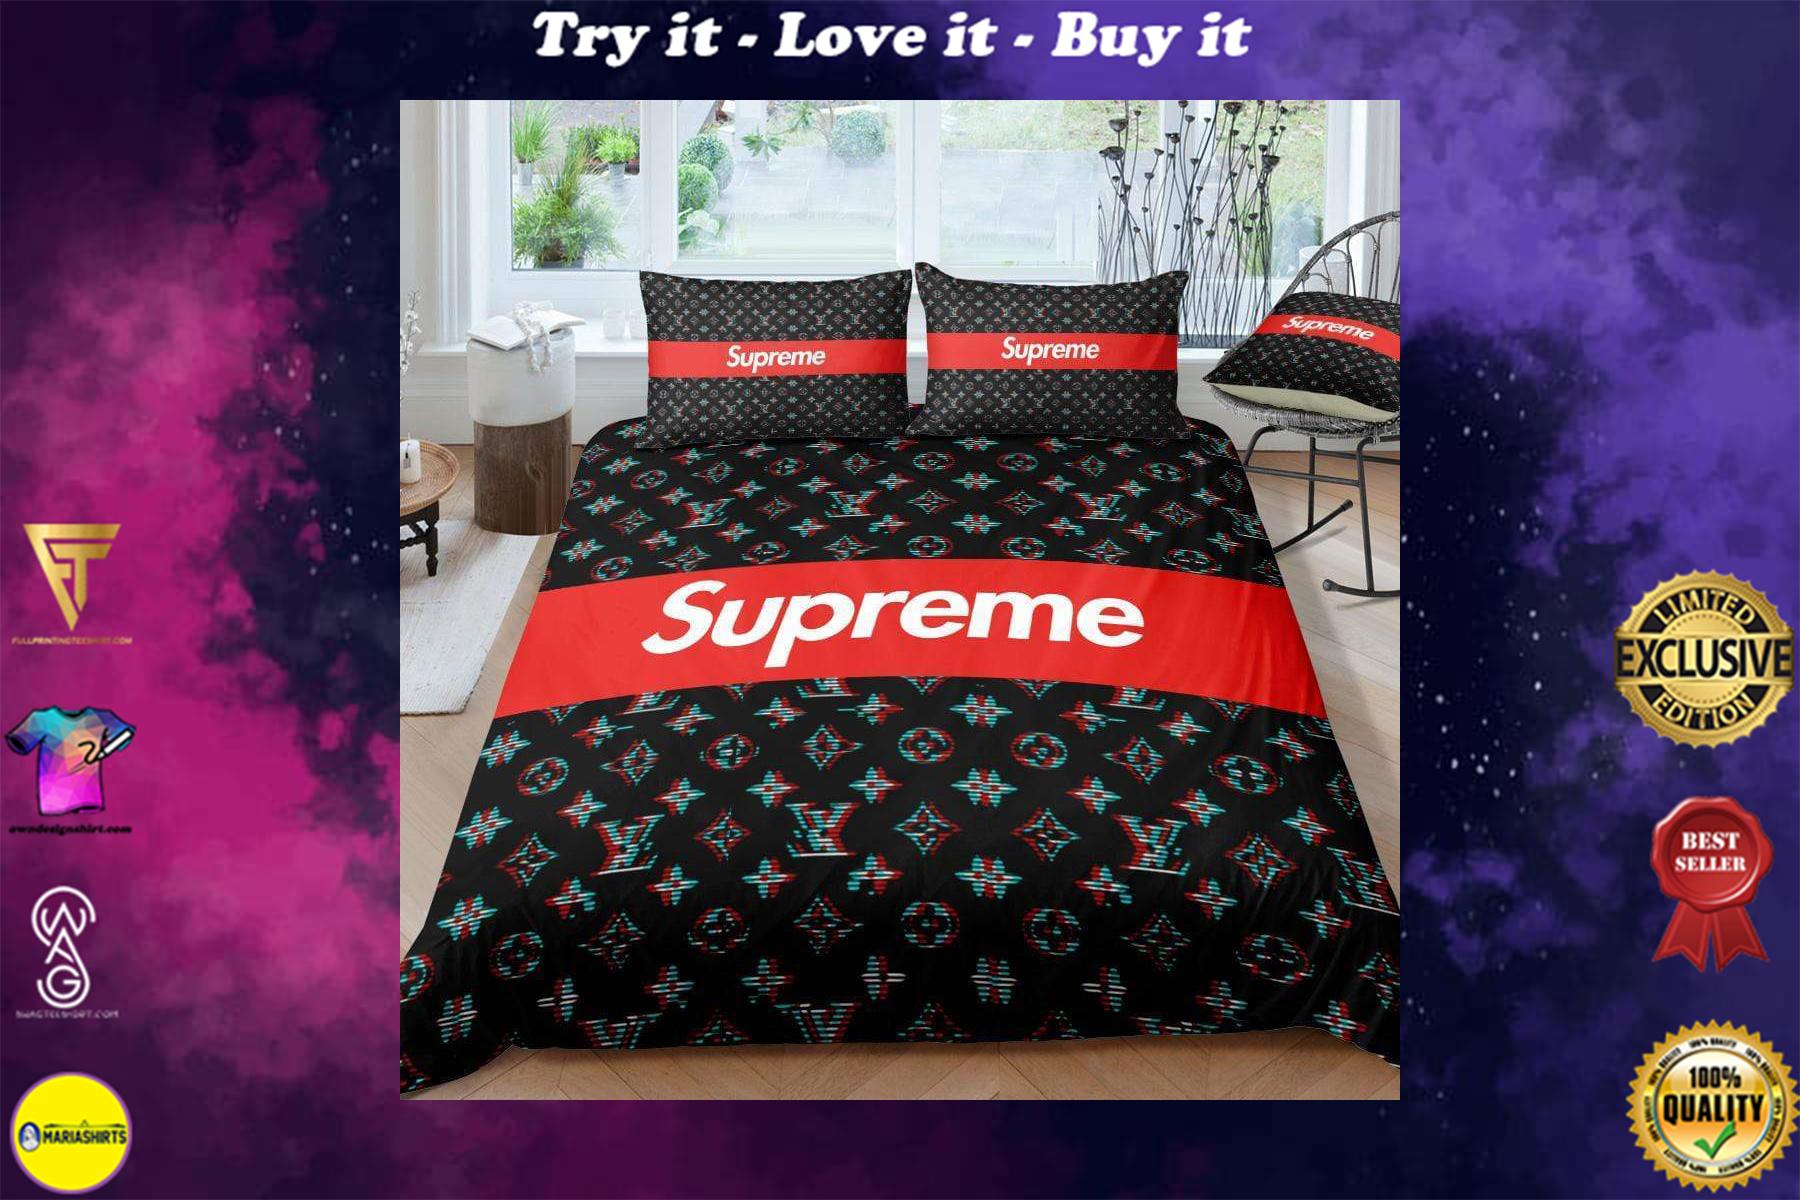 [special edition] louis vuitton and supreme monogram bedding set - maria